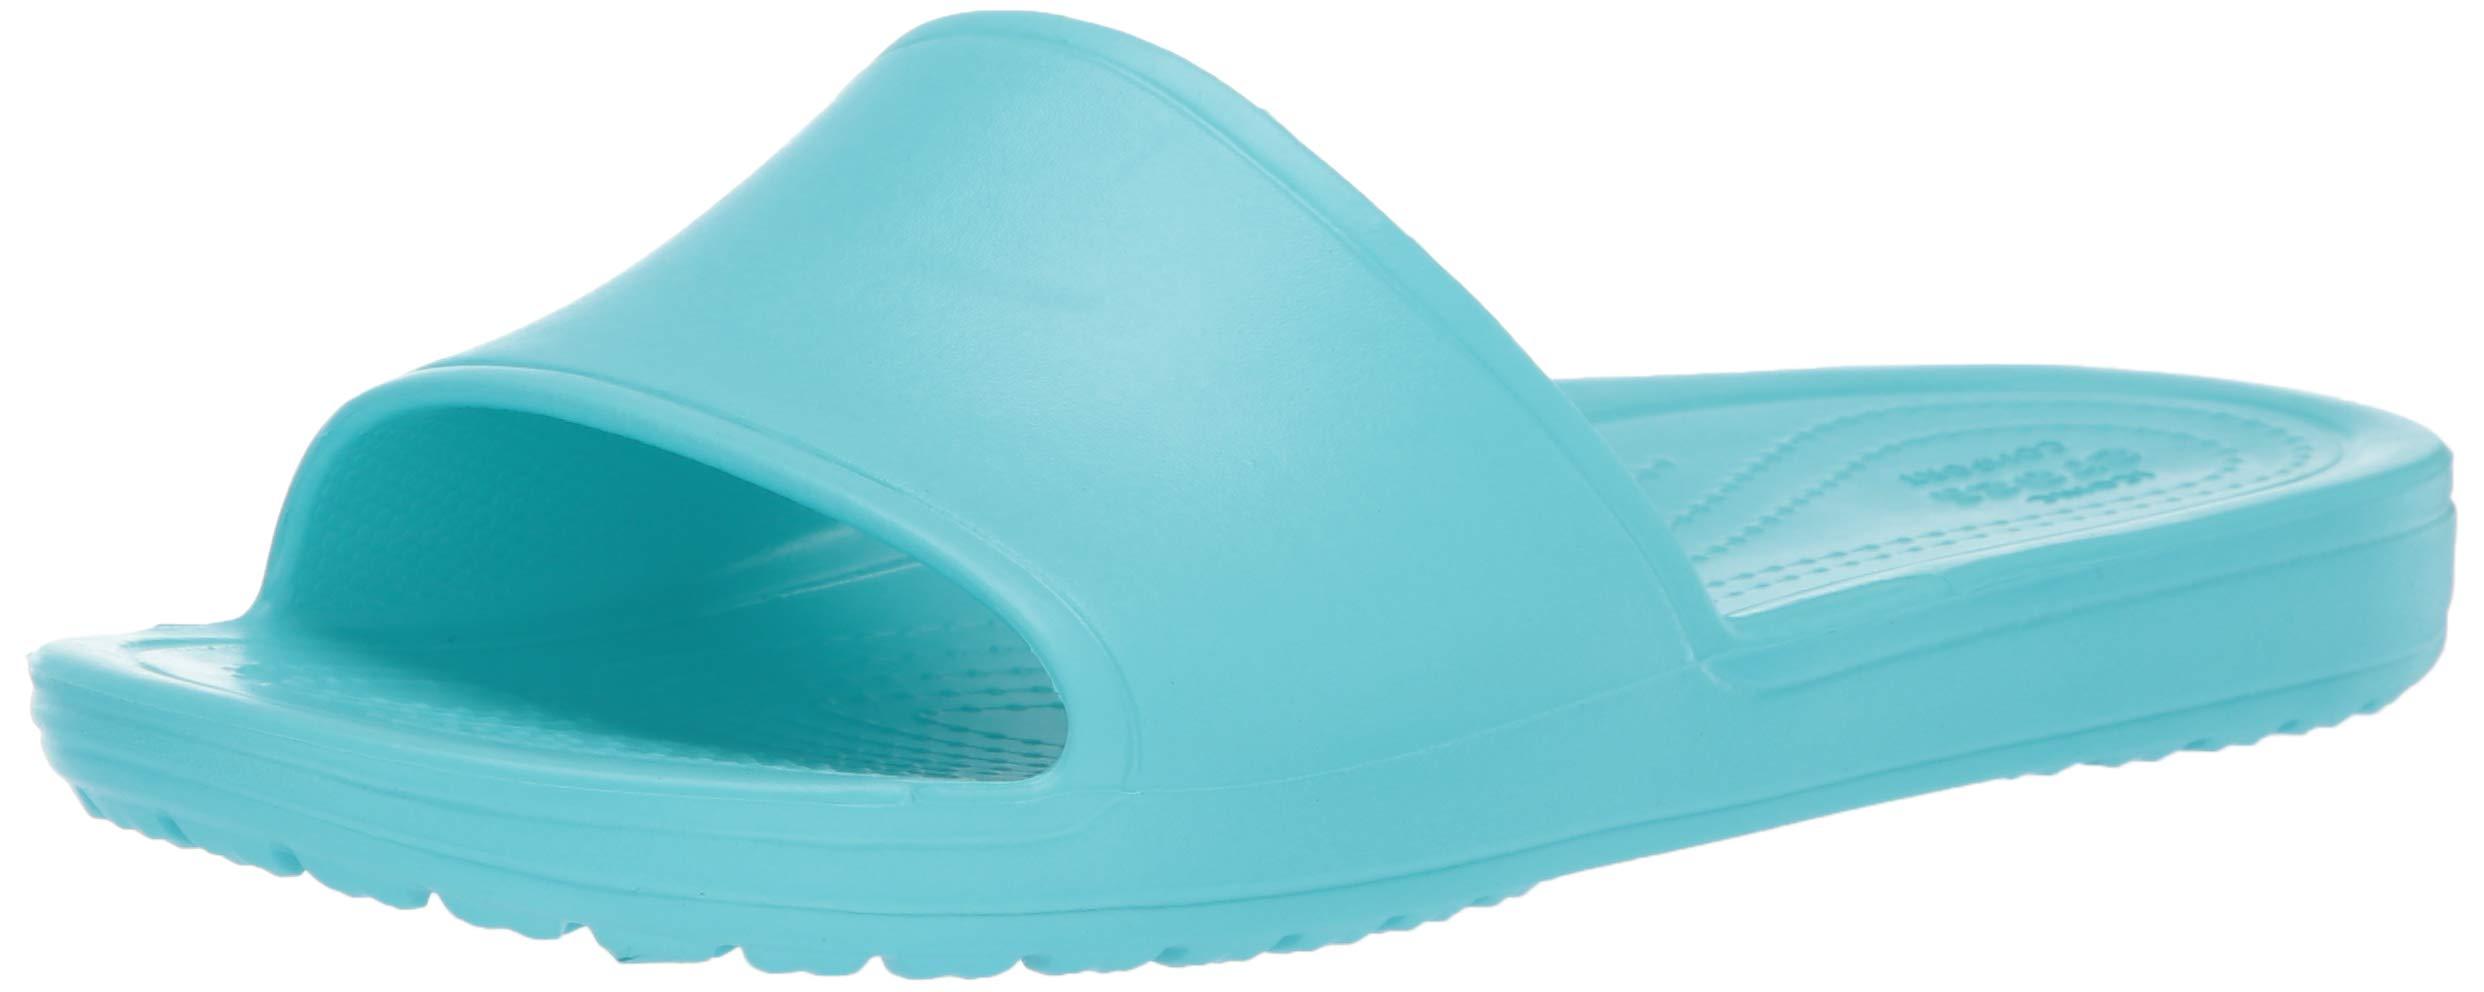 Crocs Sloane Slide Sandali Punta Aperta Donna